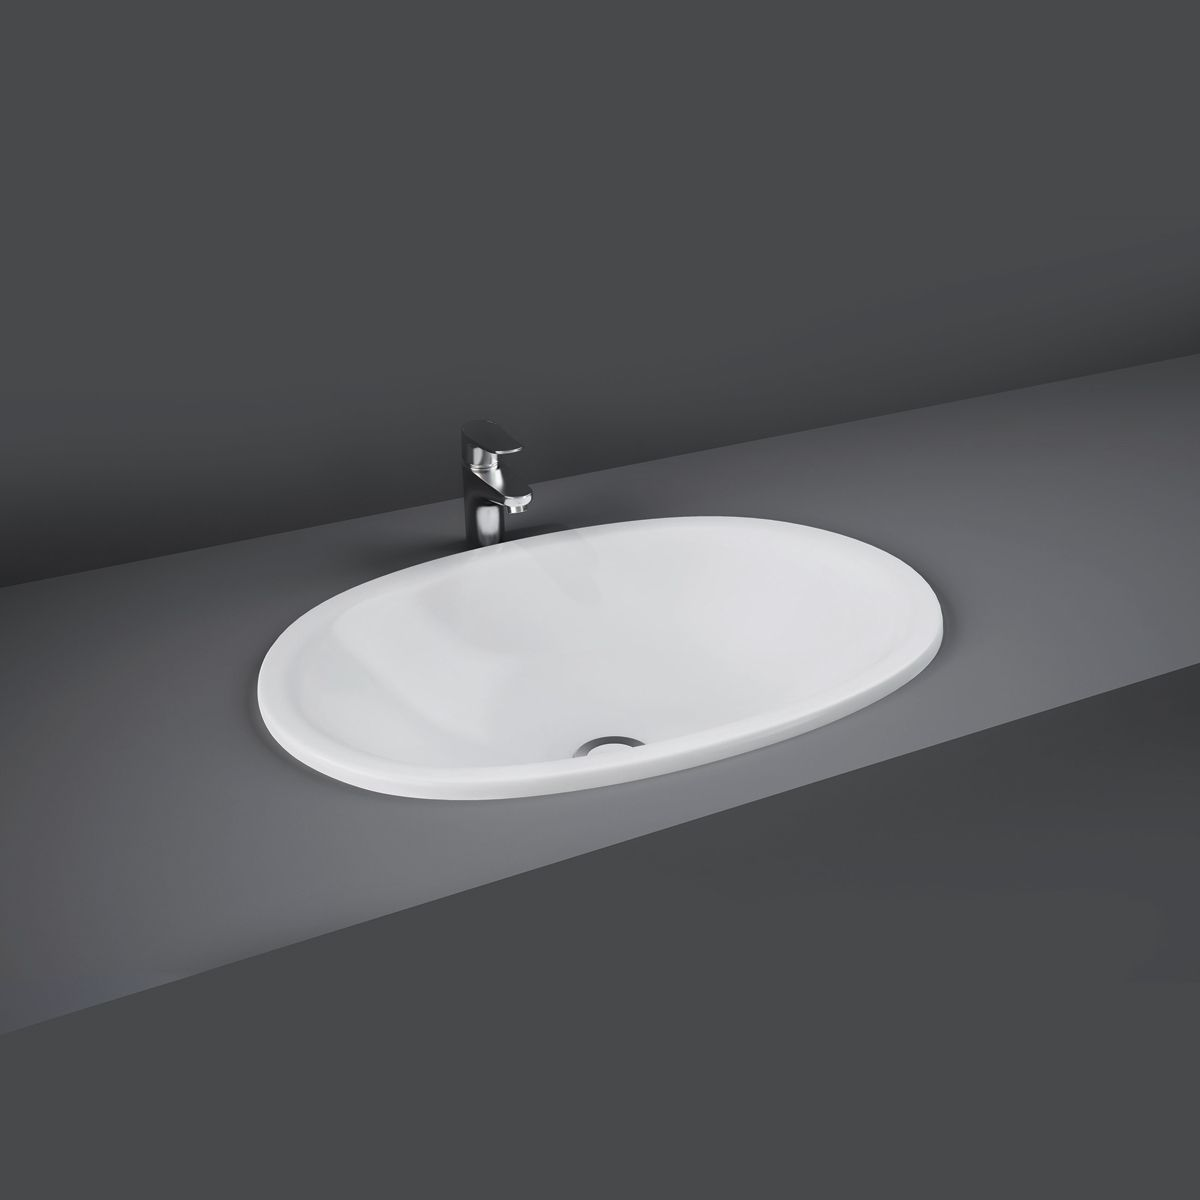 RAK Lily Over-Counter Vanity Bowl 460mm